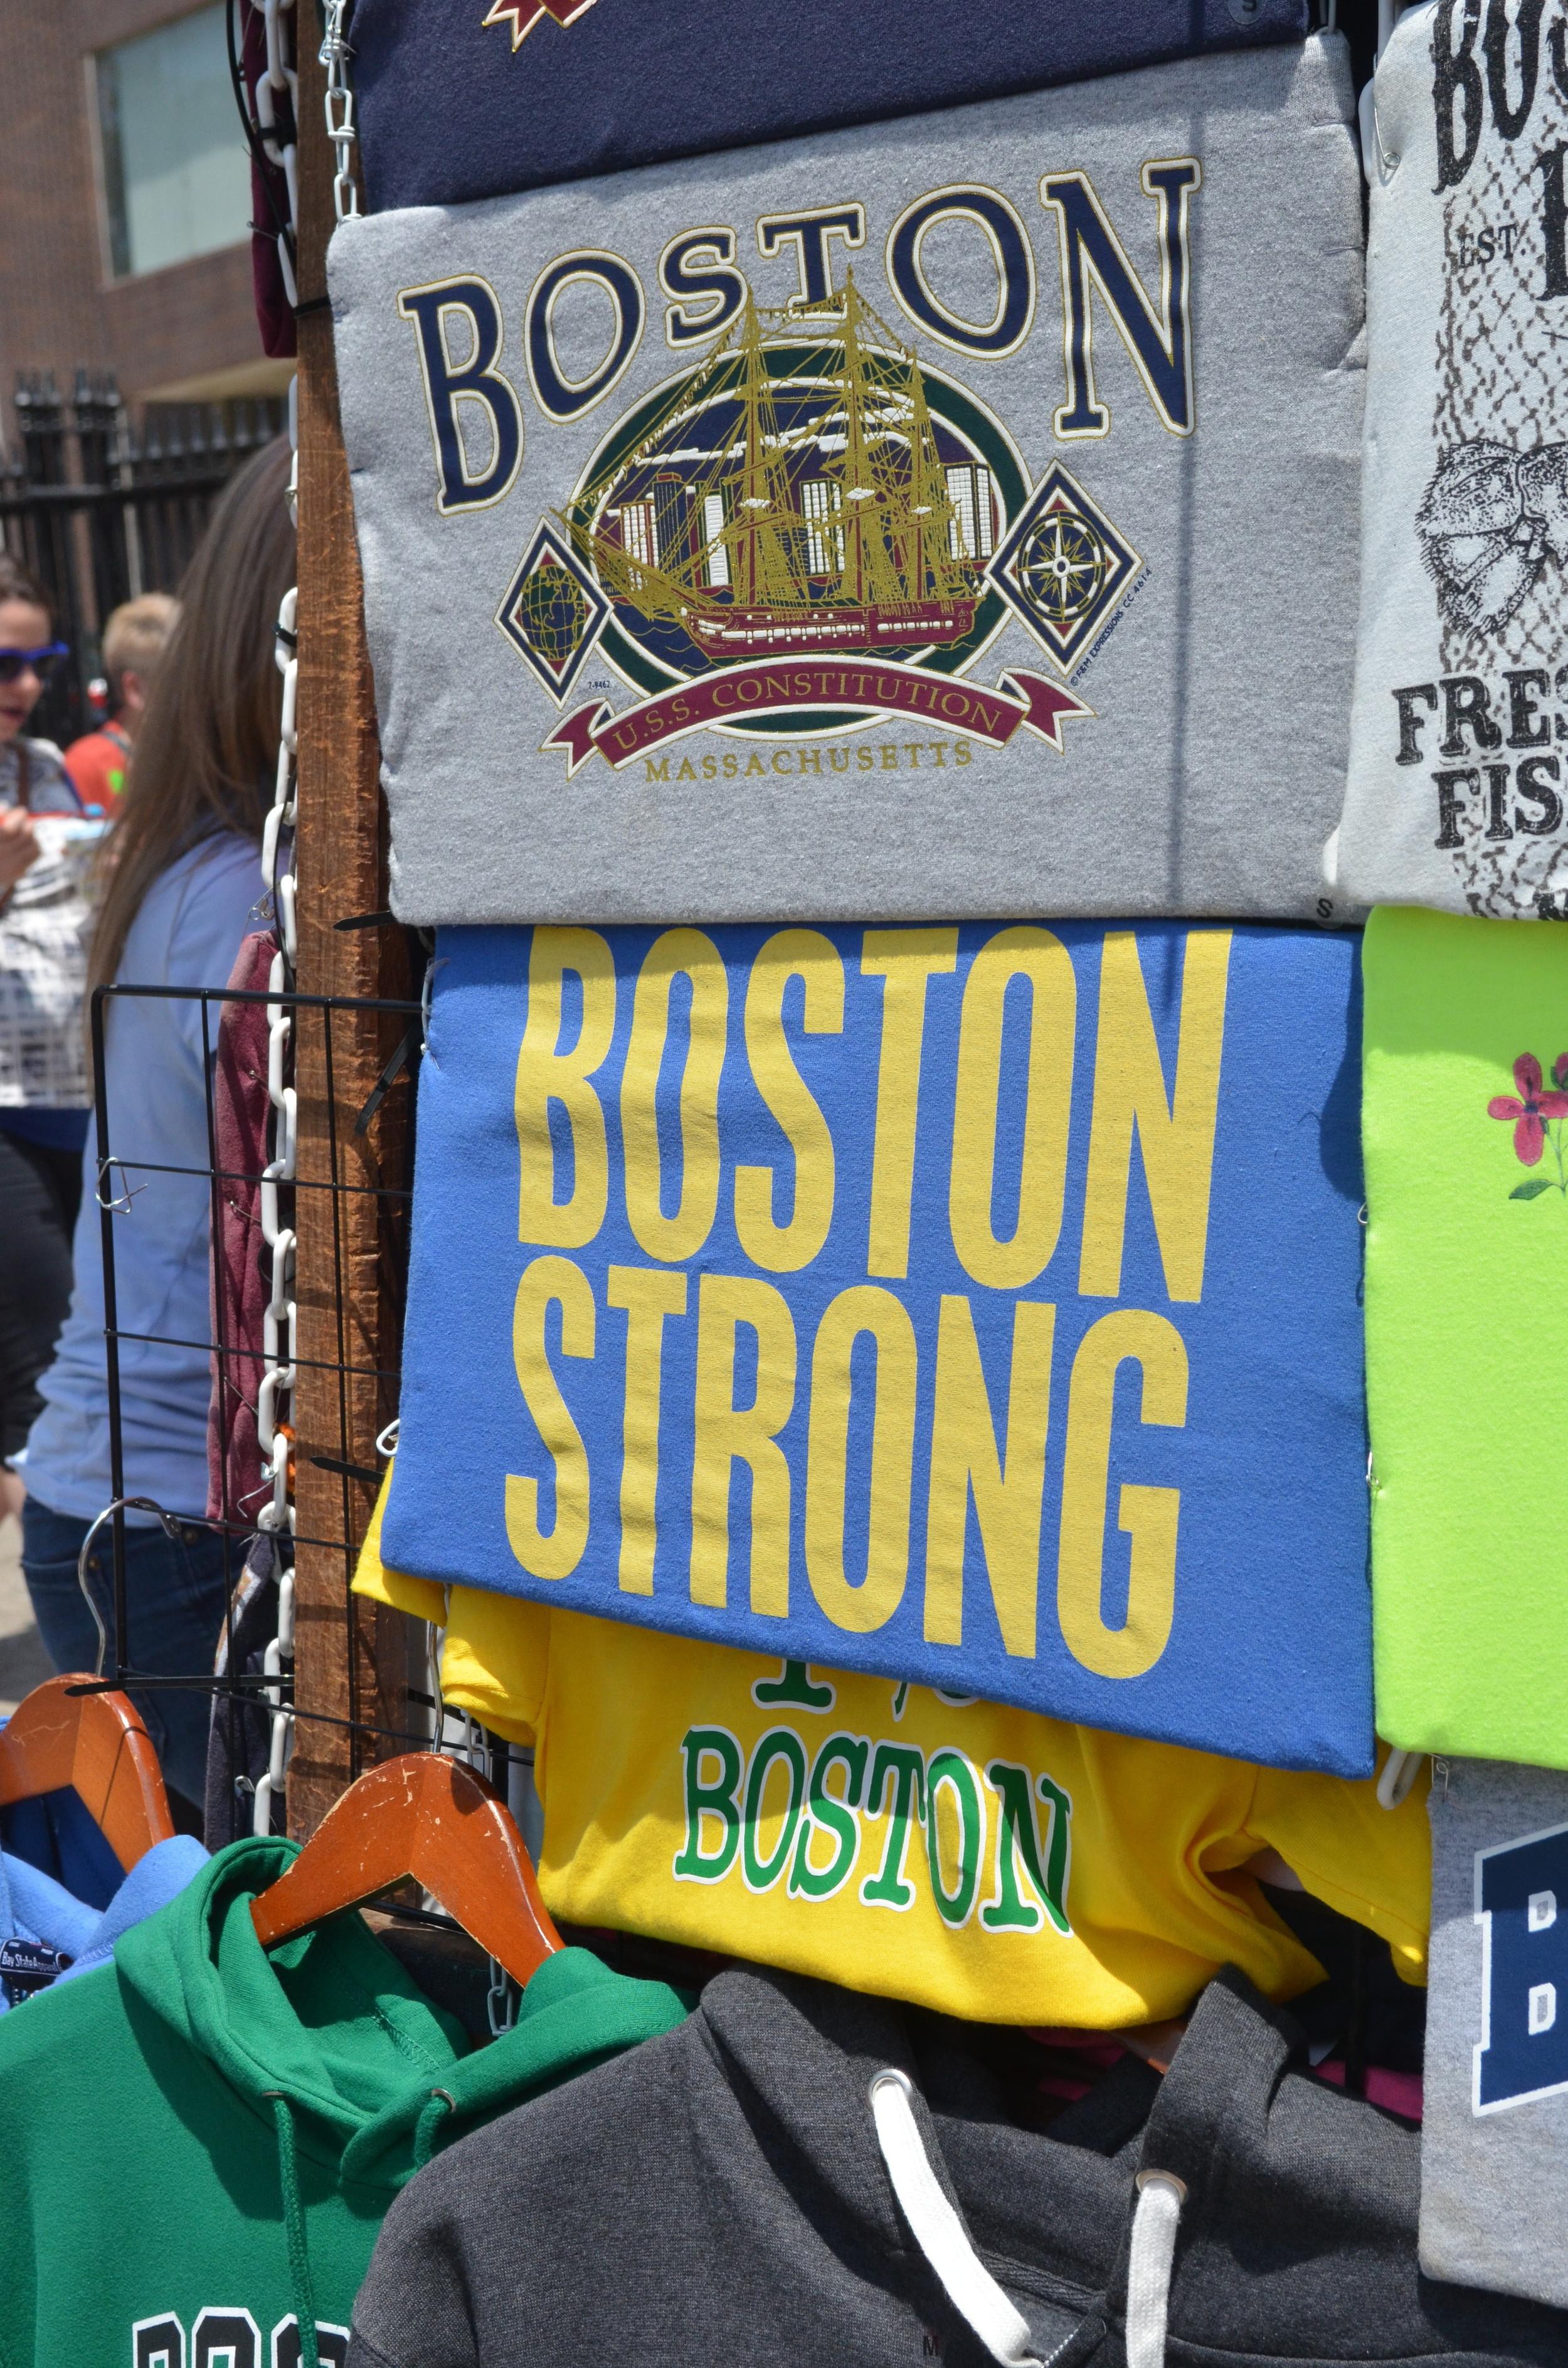 Bostonstrong.jpg